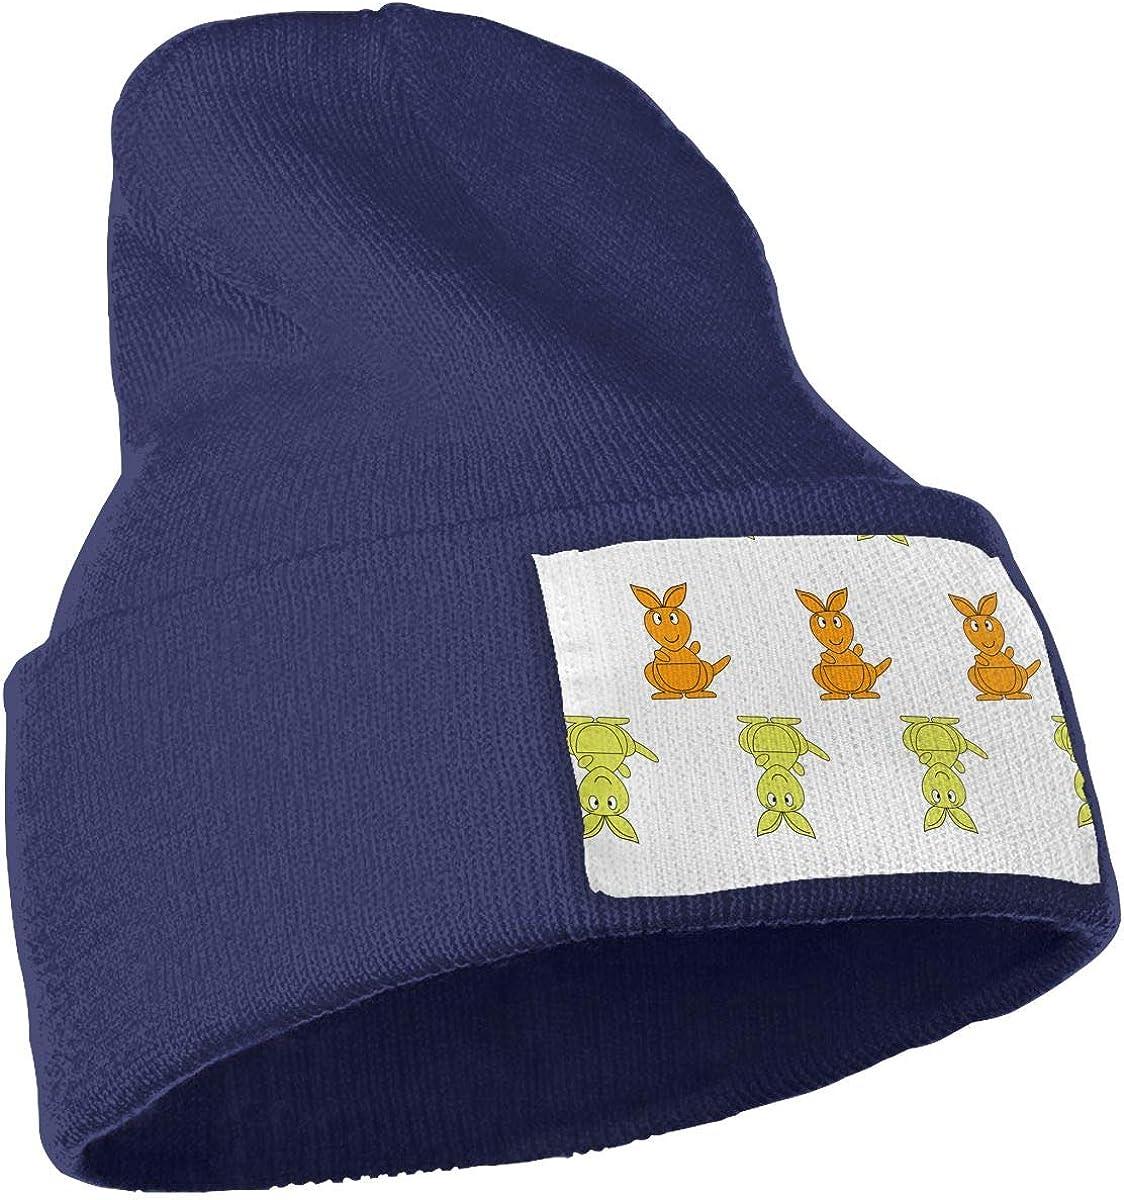 Cartoon Kangaroo Unisex Winter Knitting Woolen Hat Warm Cap